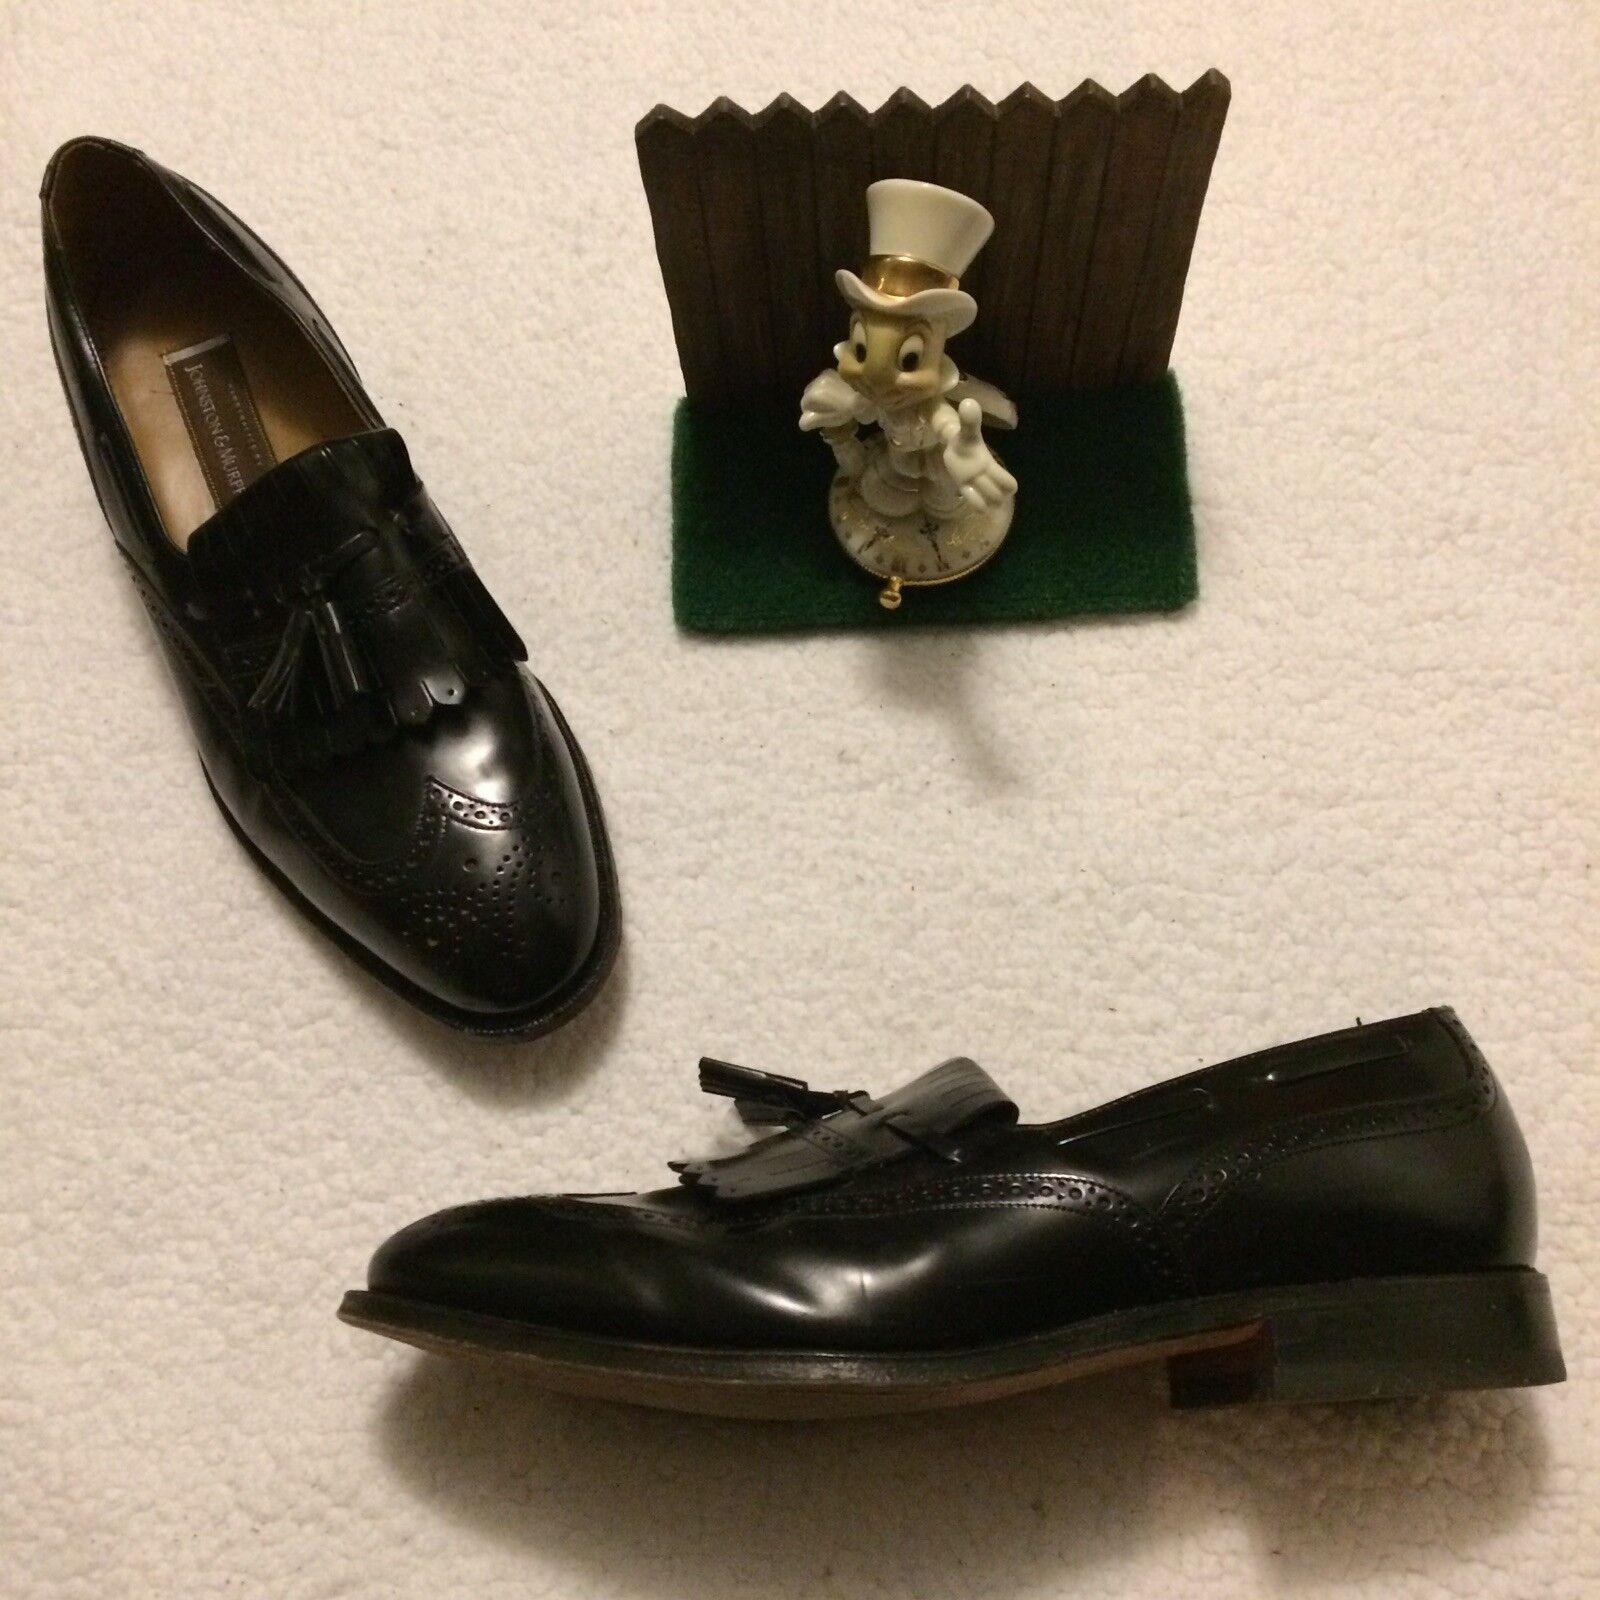 Johnson & Murphy Tolliver Italian Dress Tassle Loafers Leather Black 11.5 D